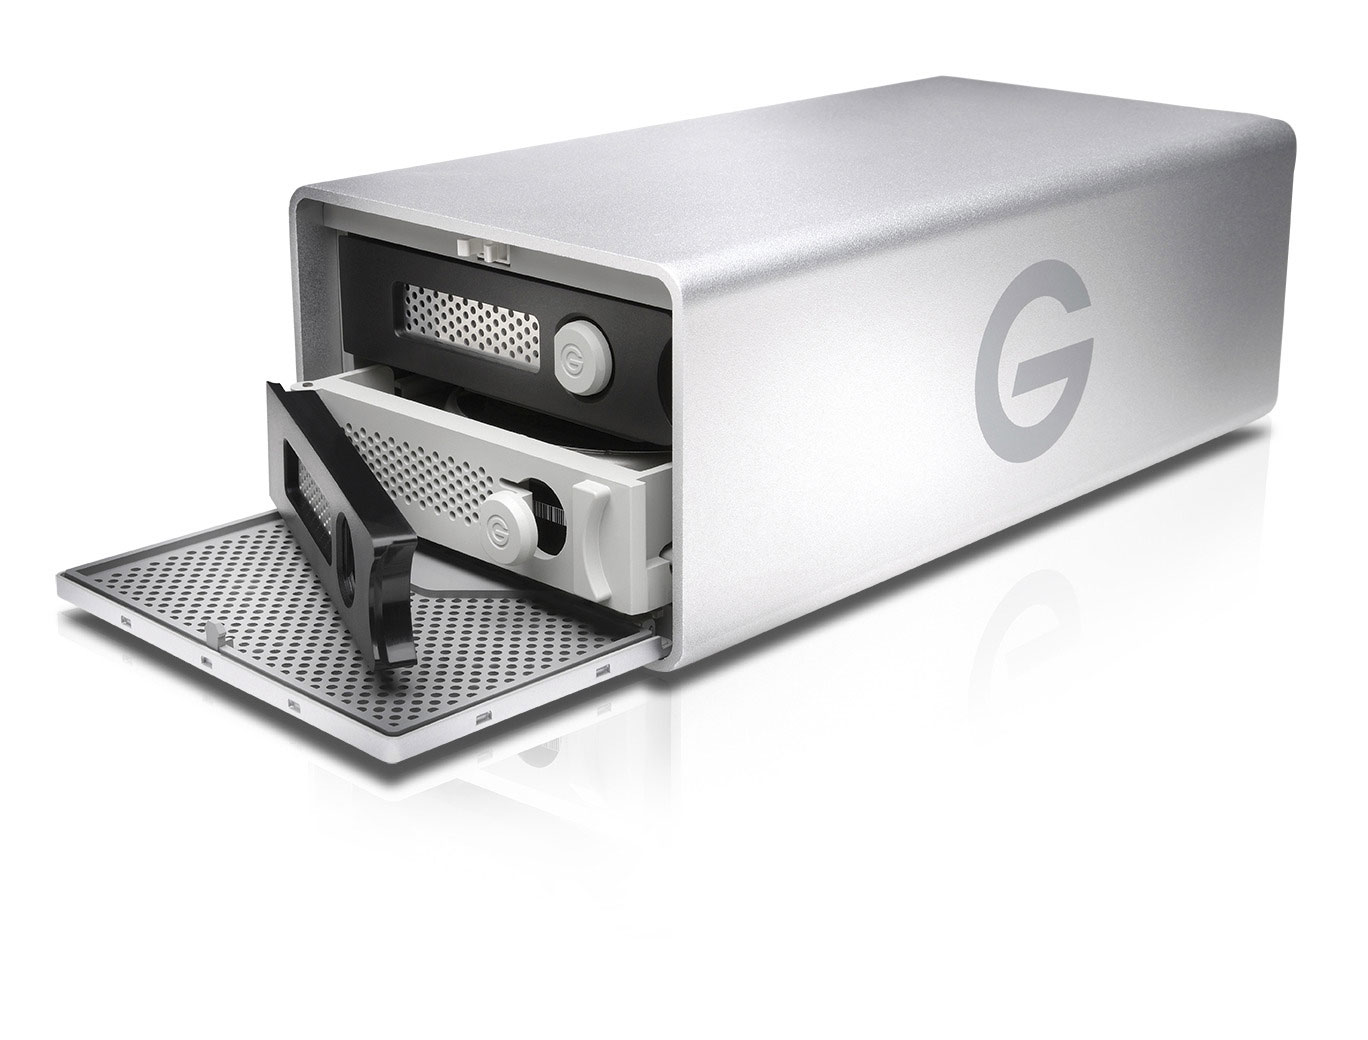 B_0614_G-RAID_disks